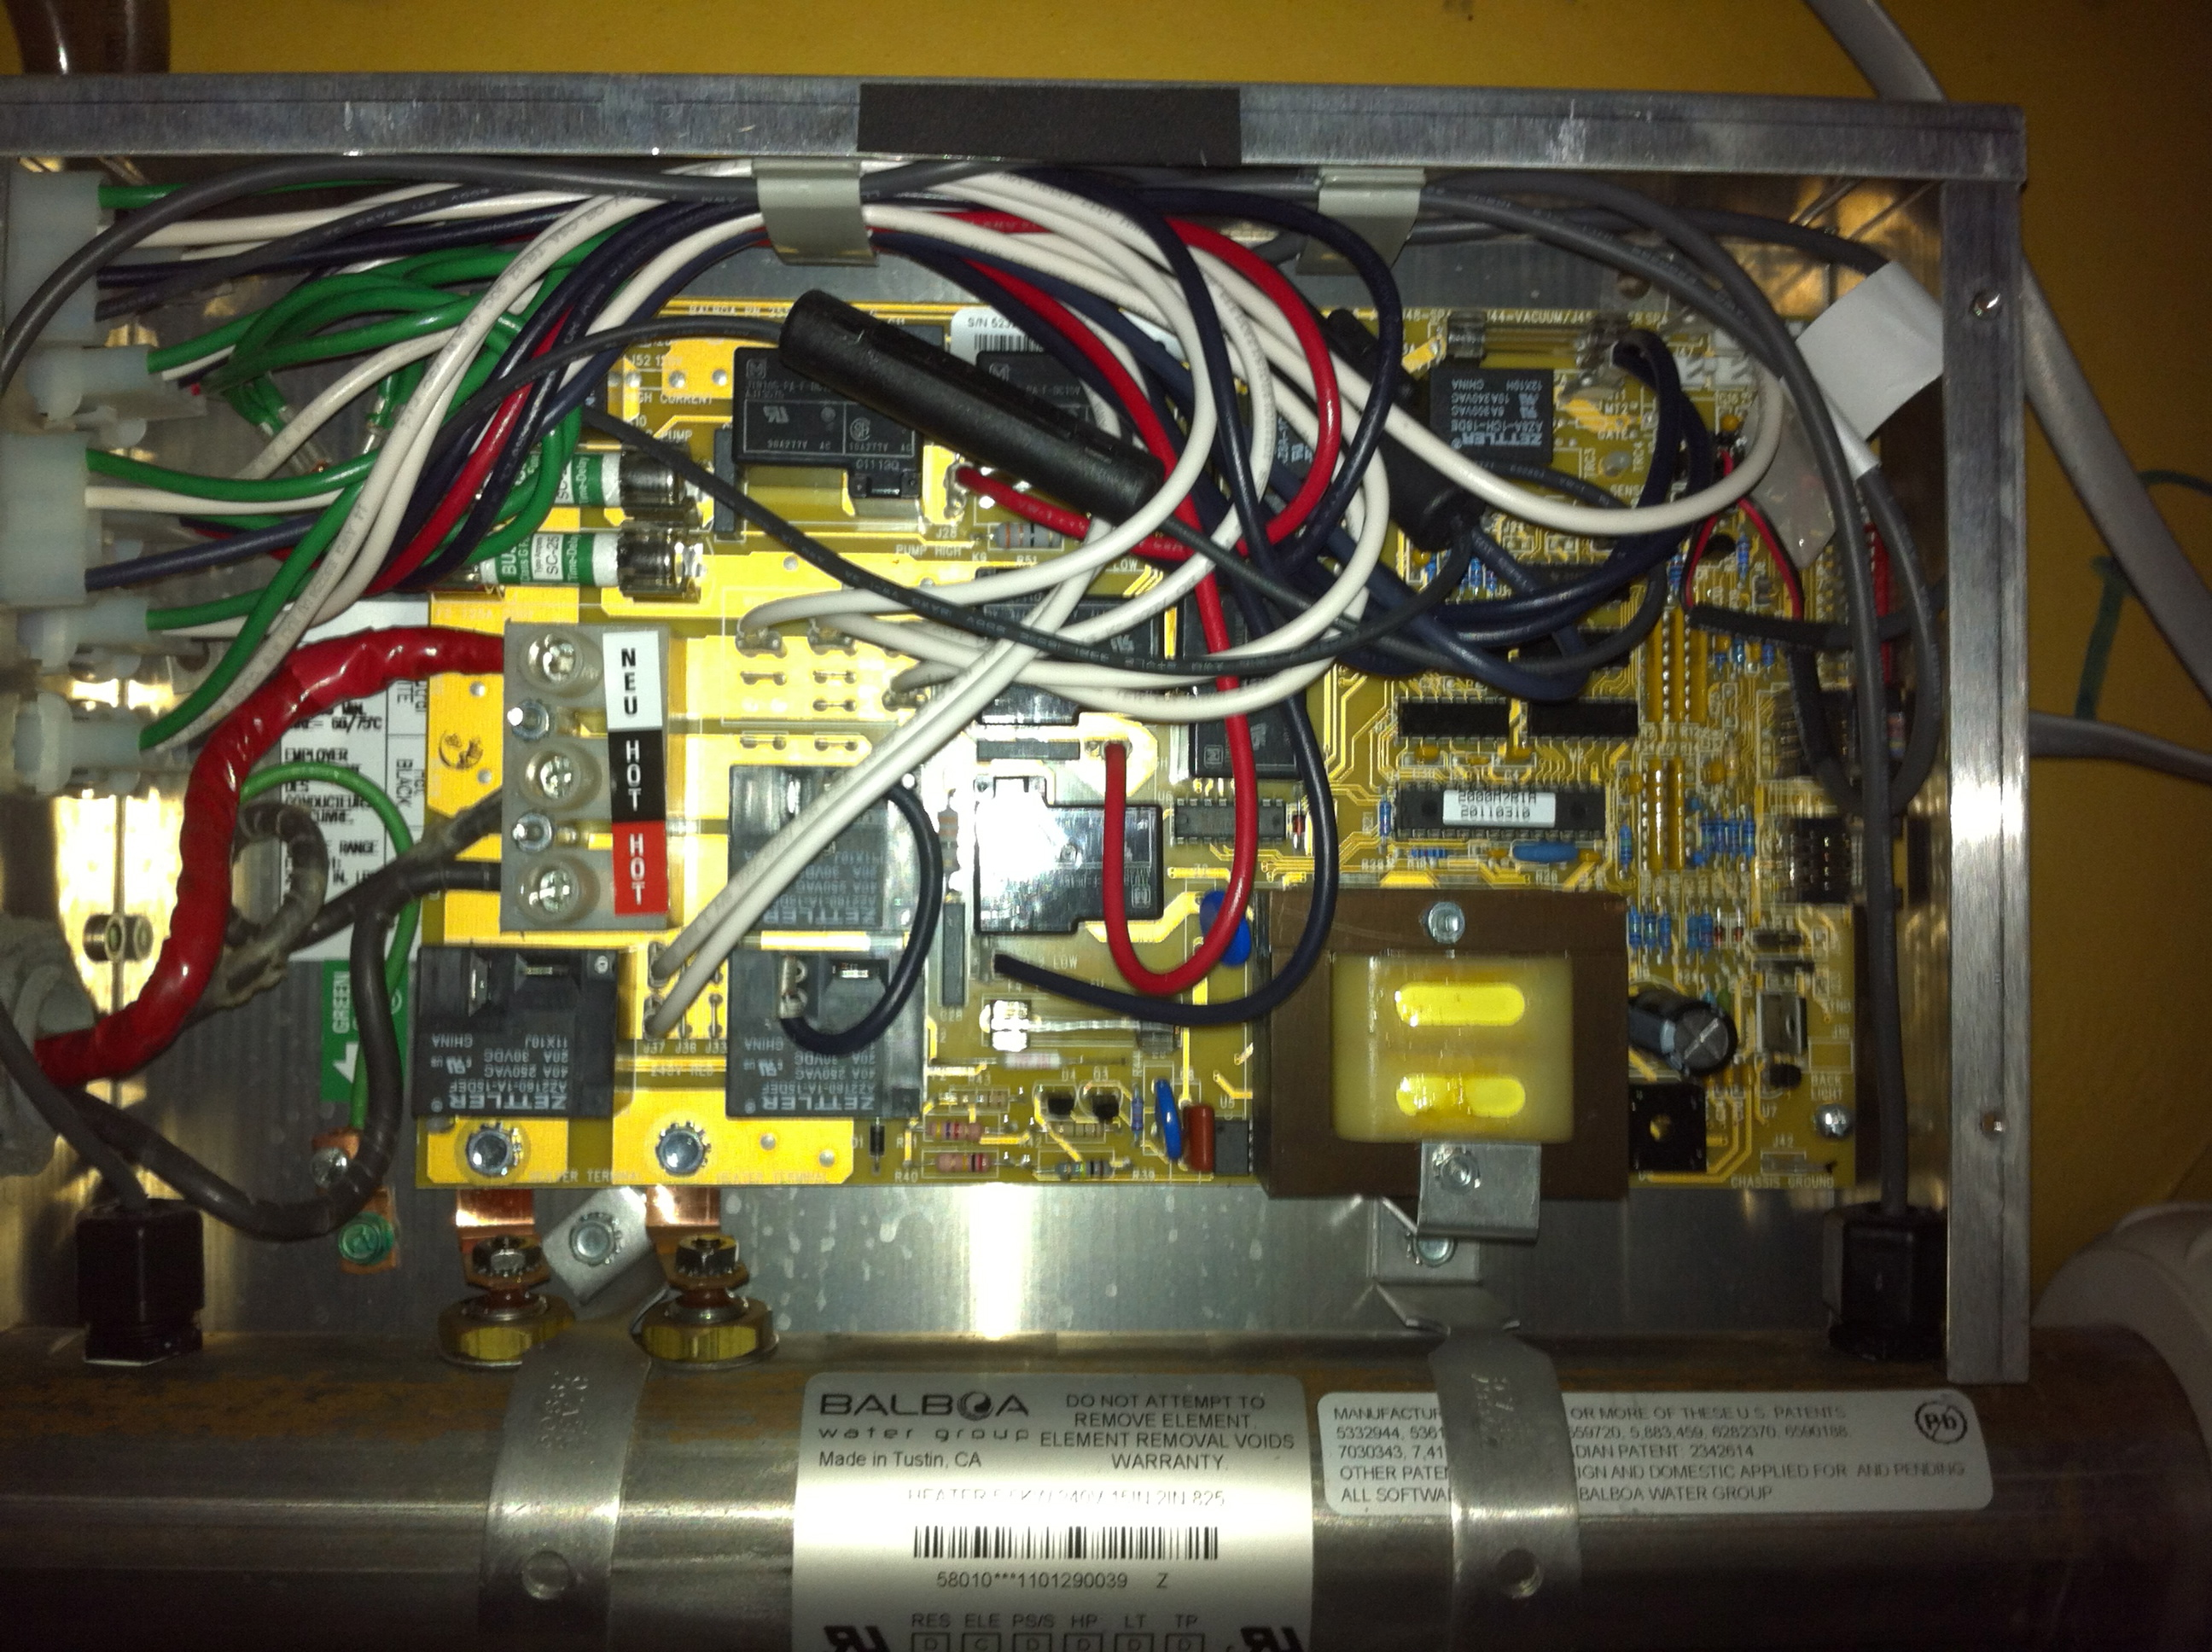 balboa wiring diagram spot welding system not working proper